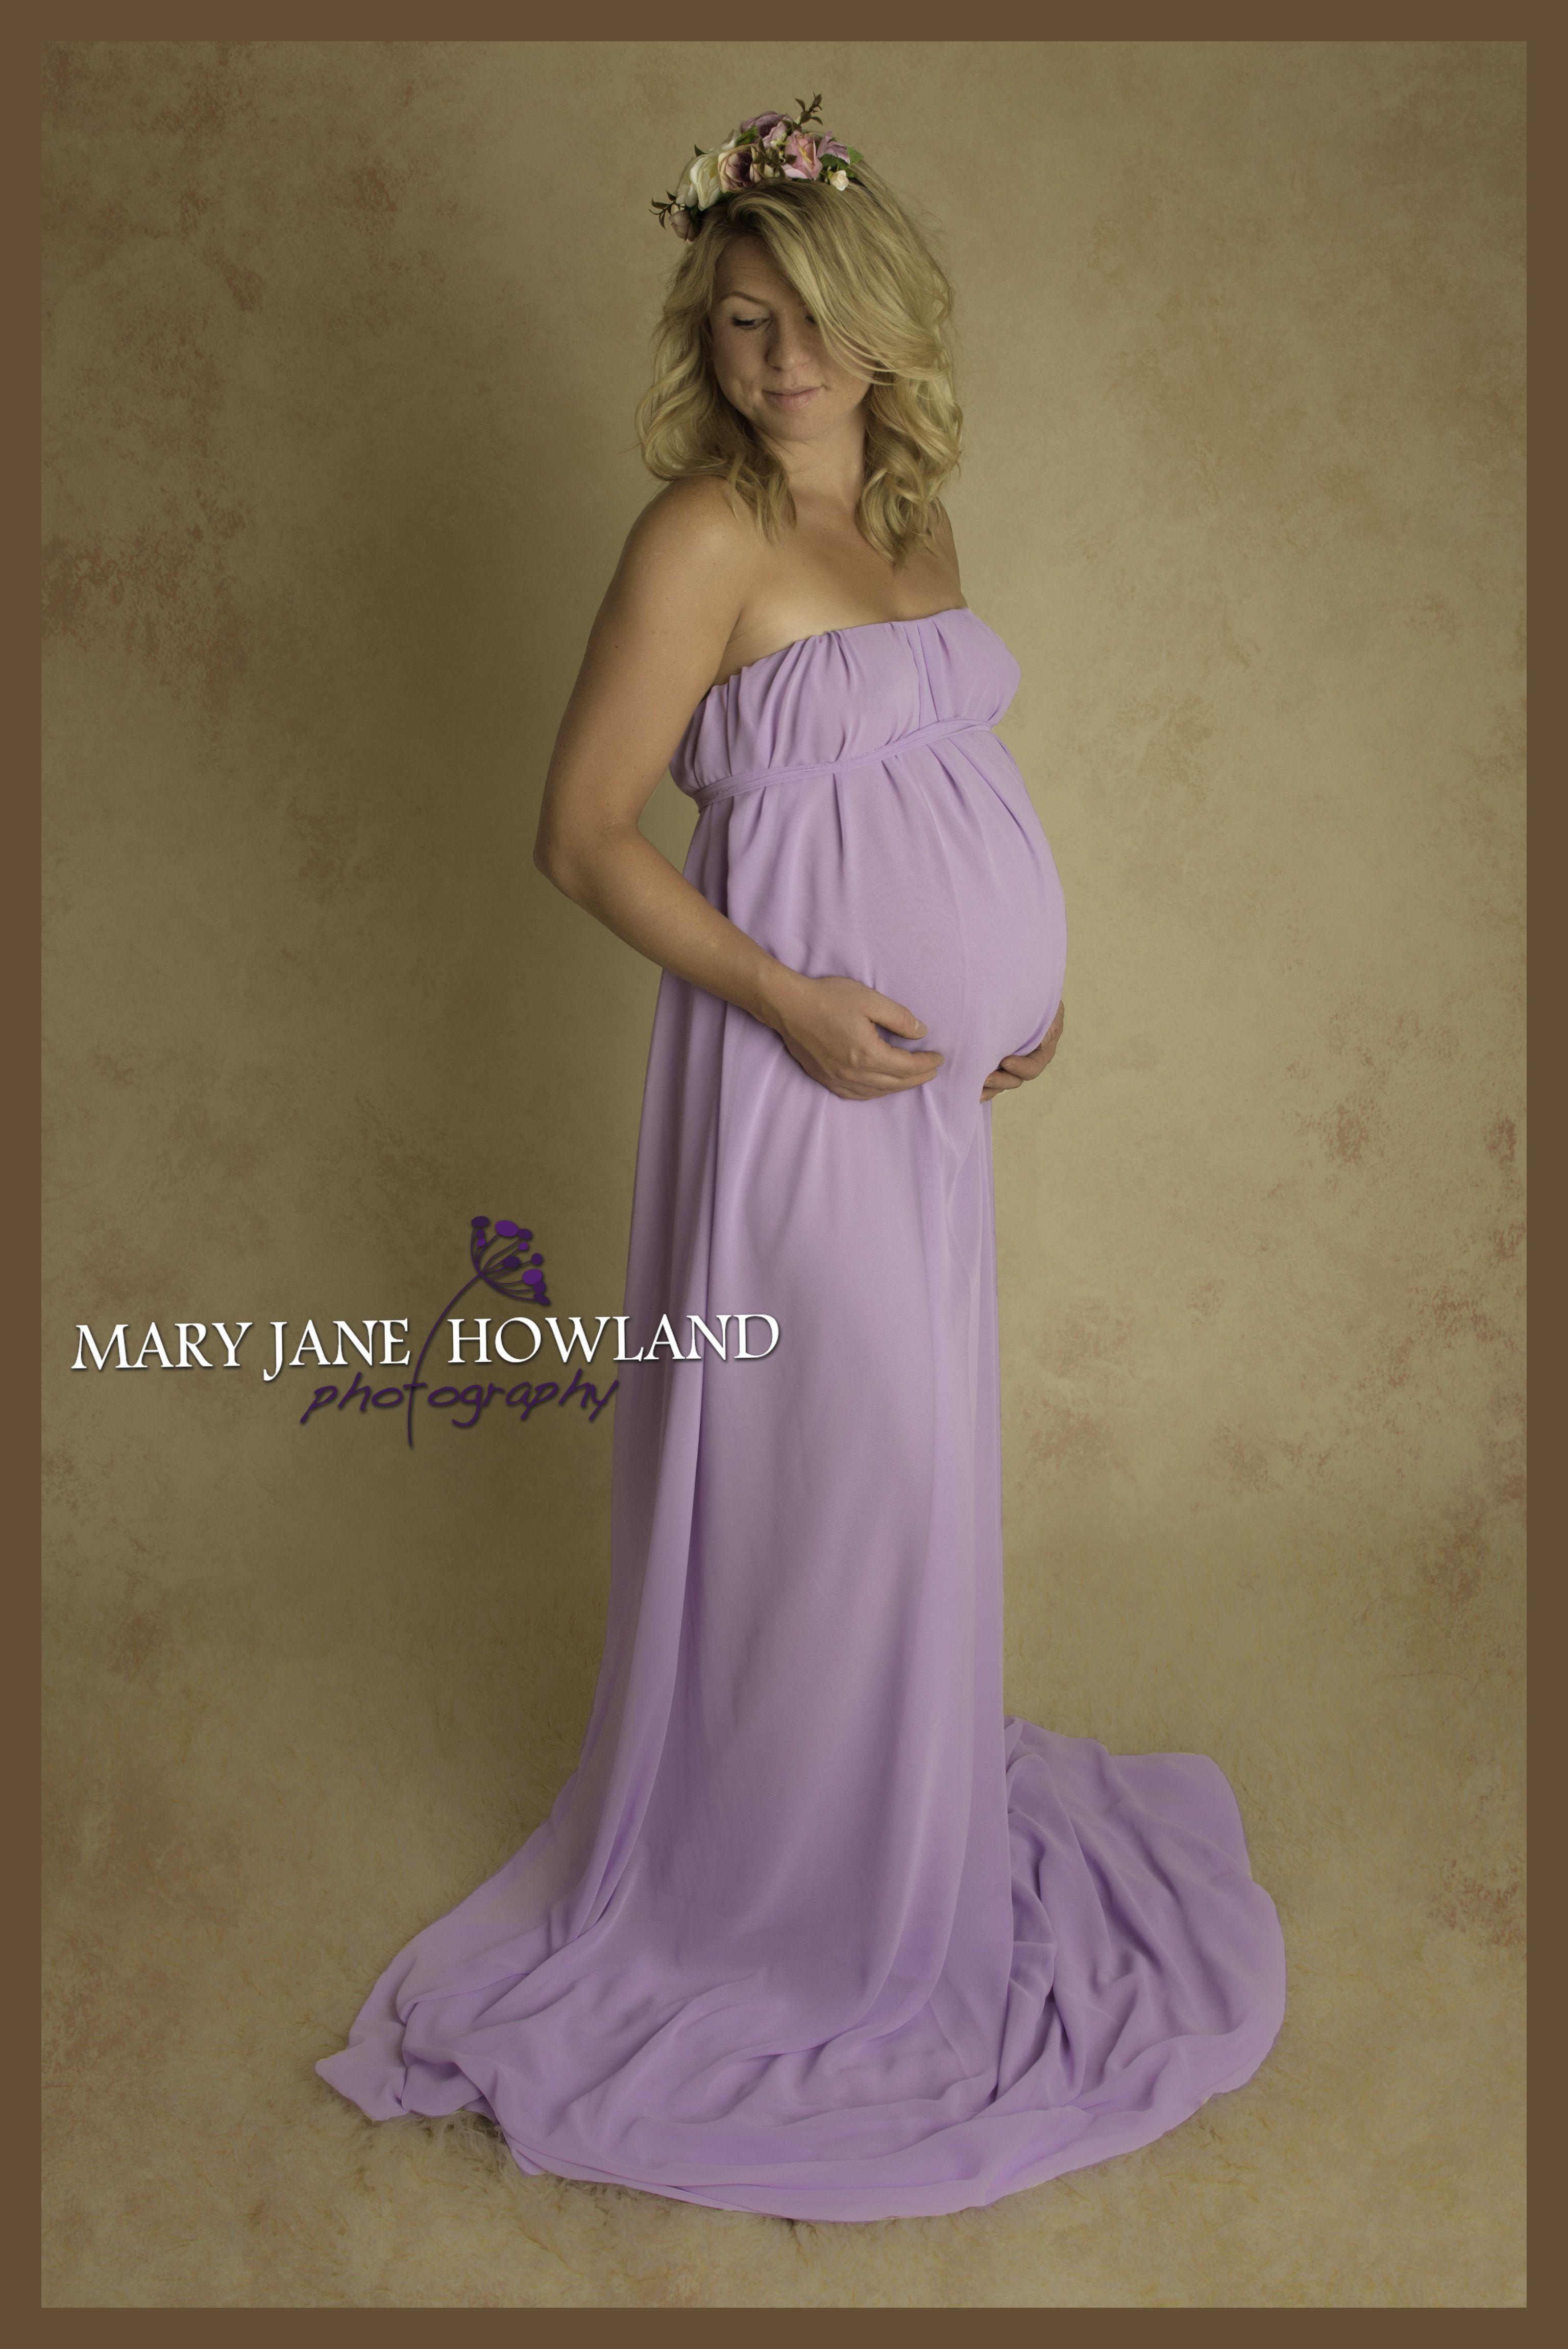 Mary Jane #1 | foto_morgana | Flickr